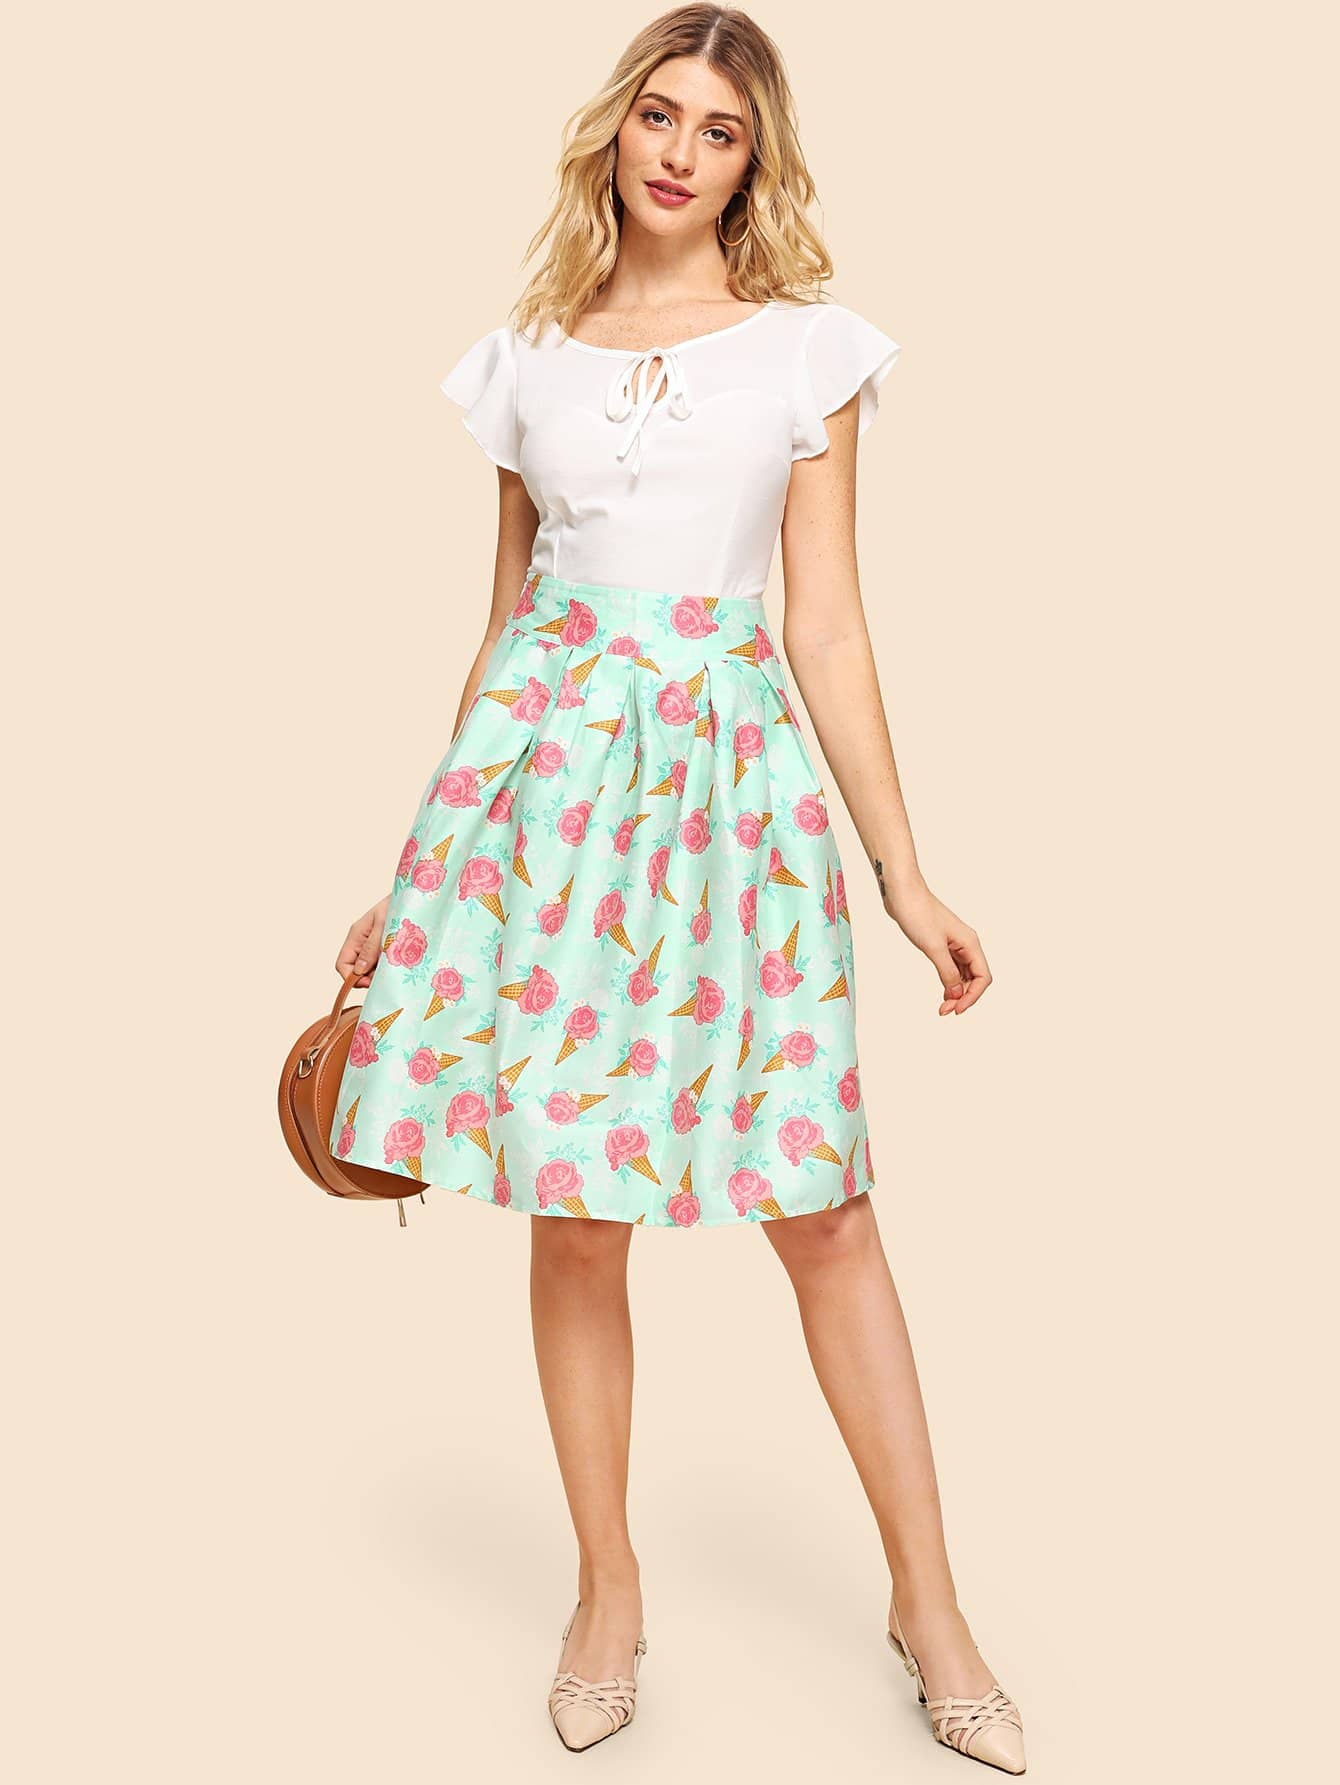 Knot Neck Plain Blouse With Ice Cream Print Box Pleated Skirt plain pleated skirt